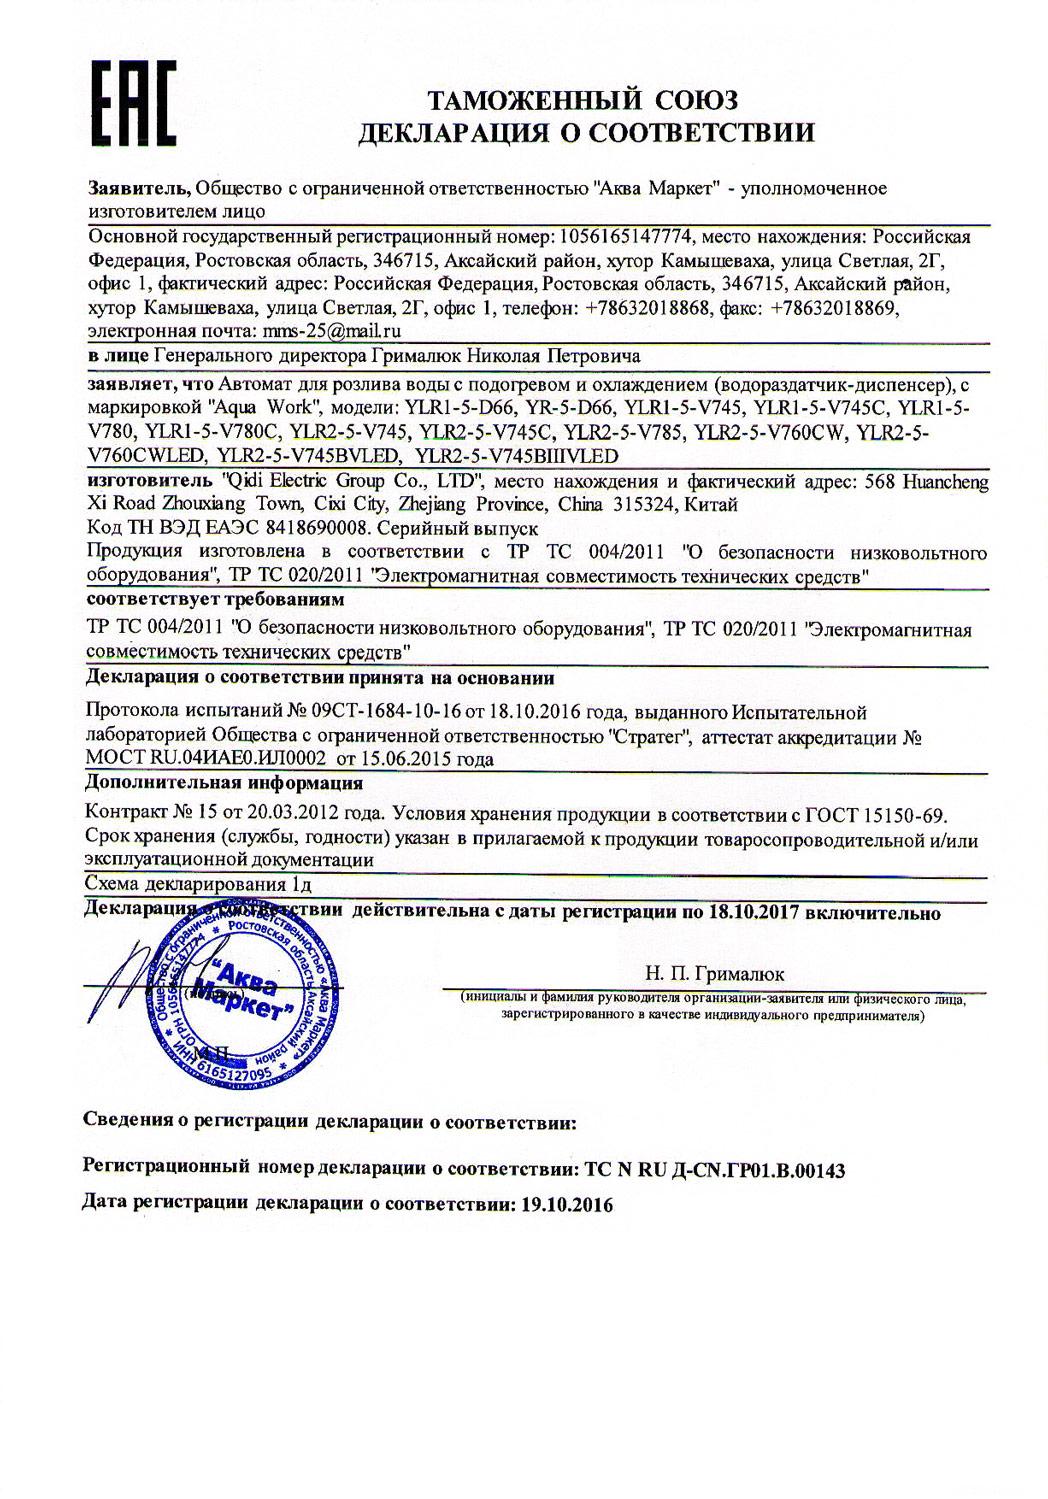 кулер Aqua Work D66 сертификат